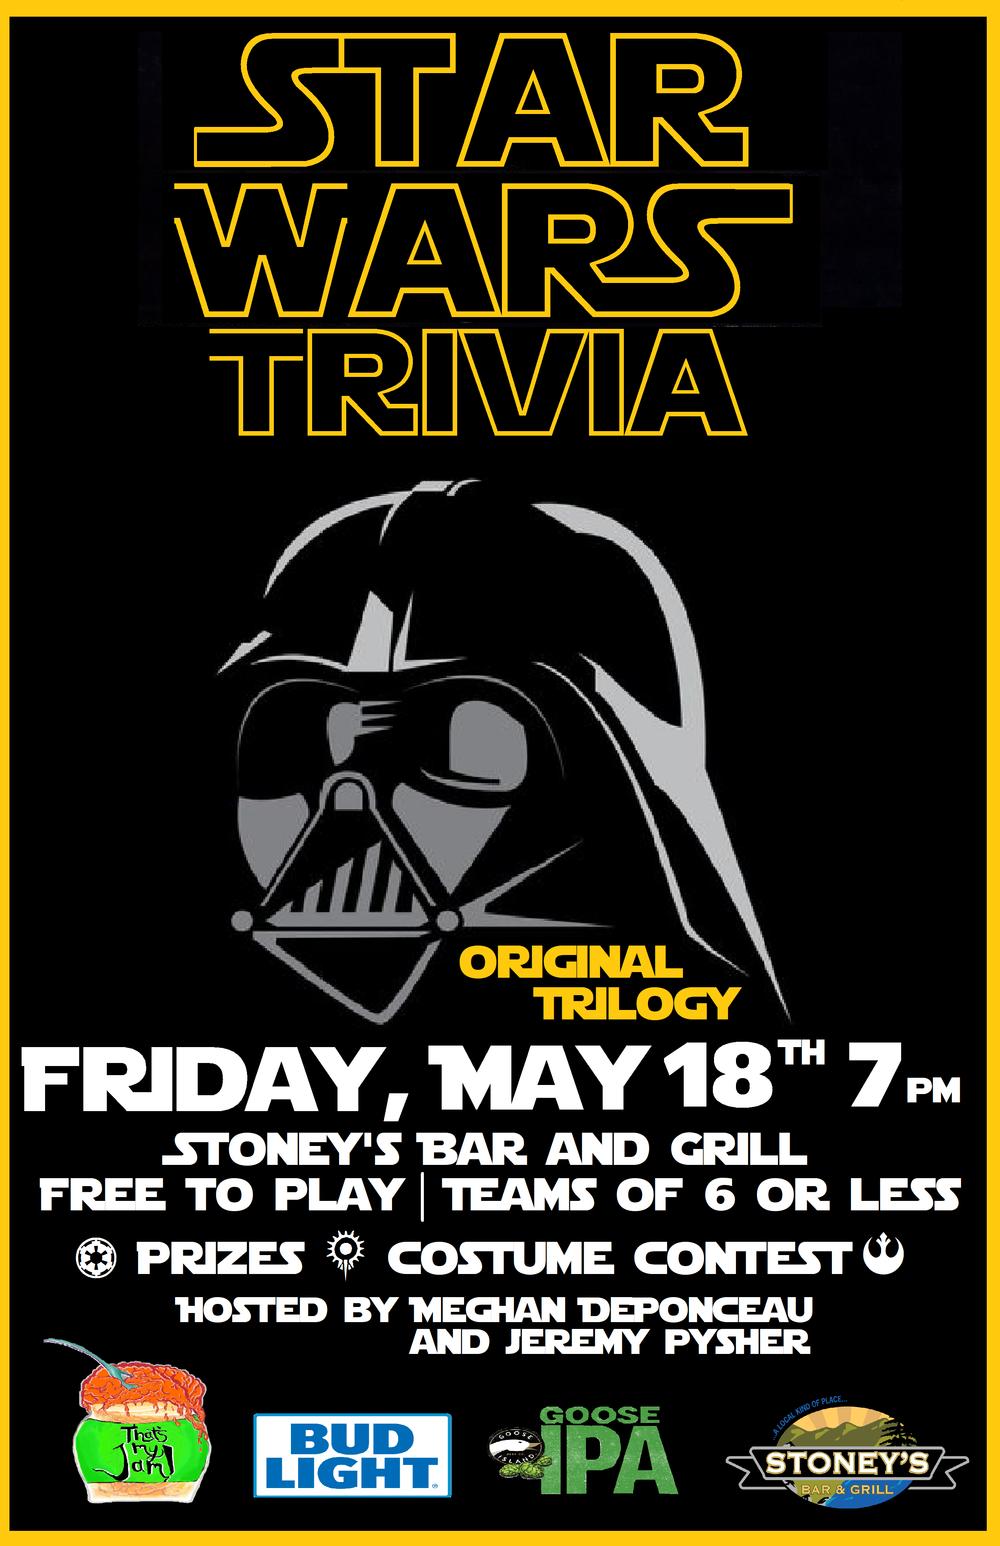 Star wars trivia.png